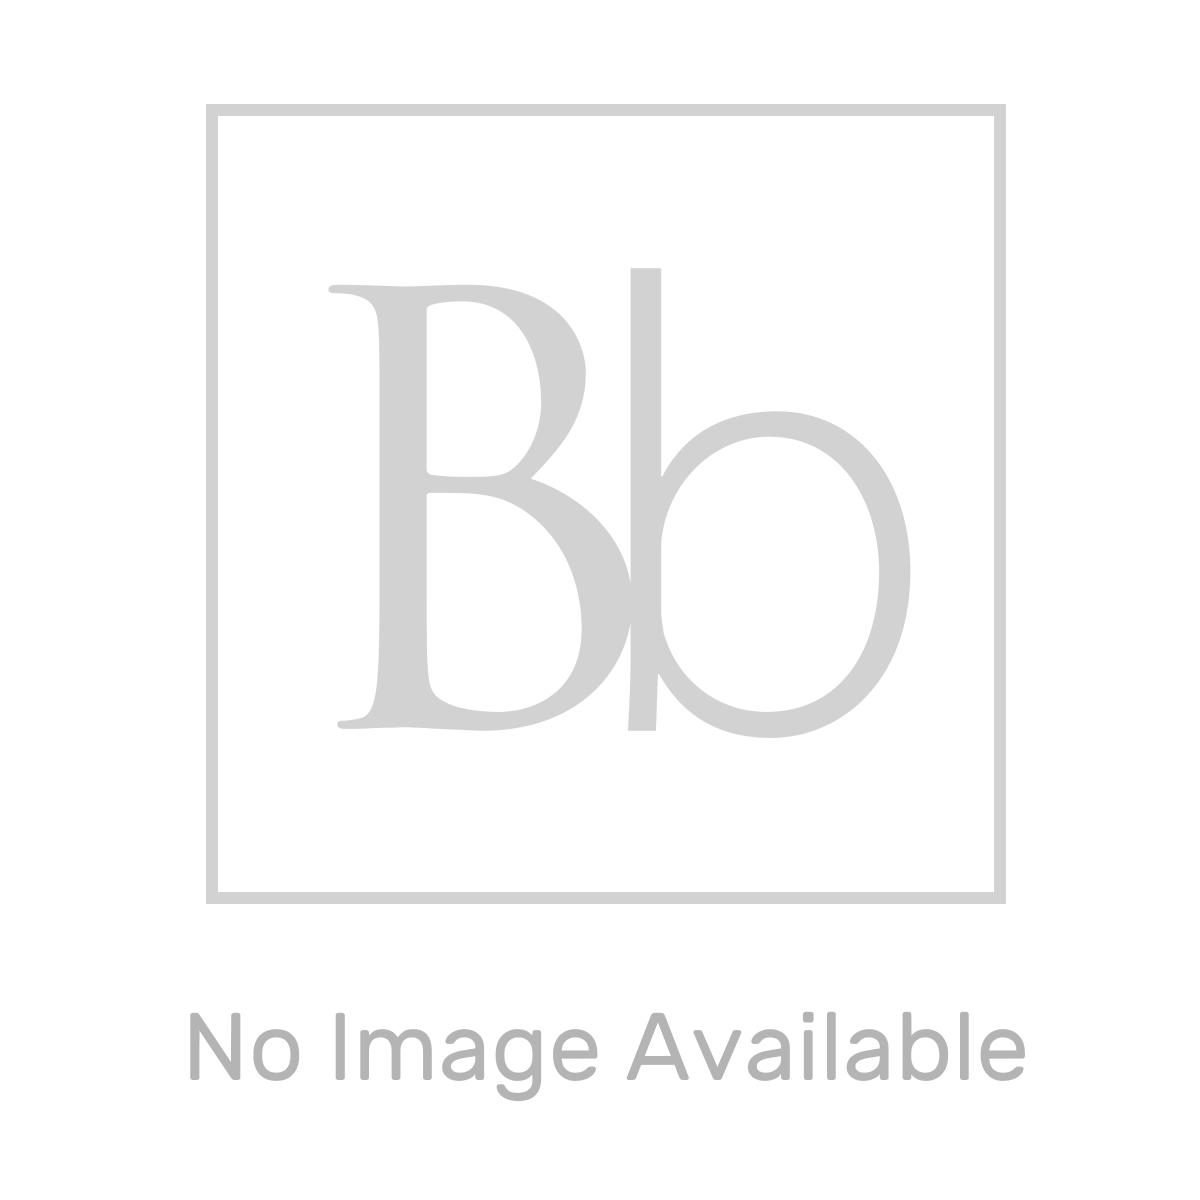 RAK Feeling Grey Rectangular Shower Tray 1700 x 800mm Measurements